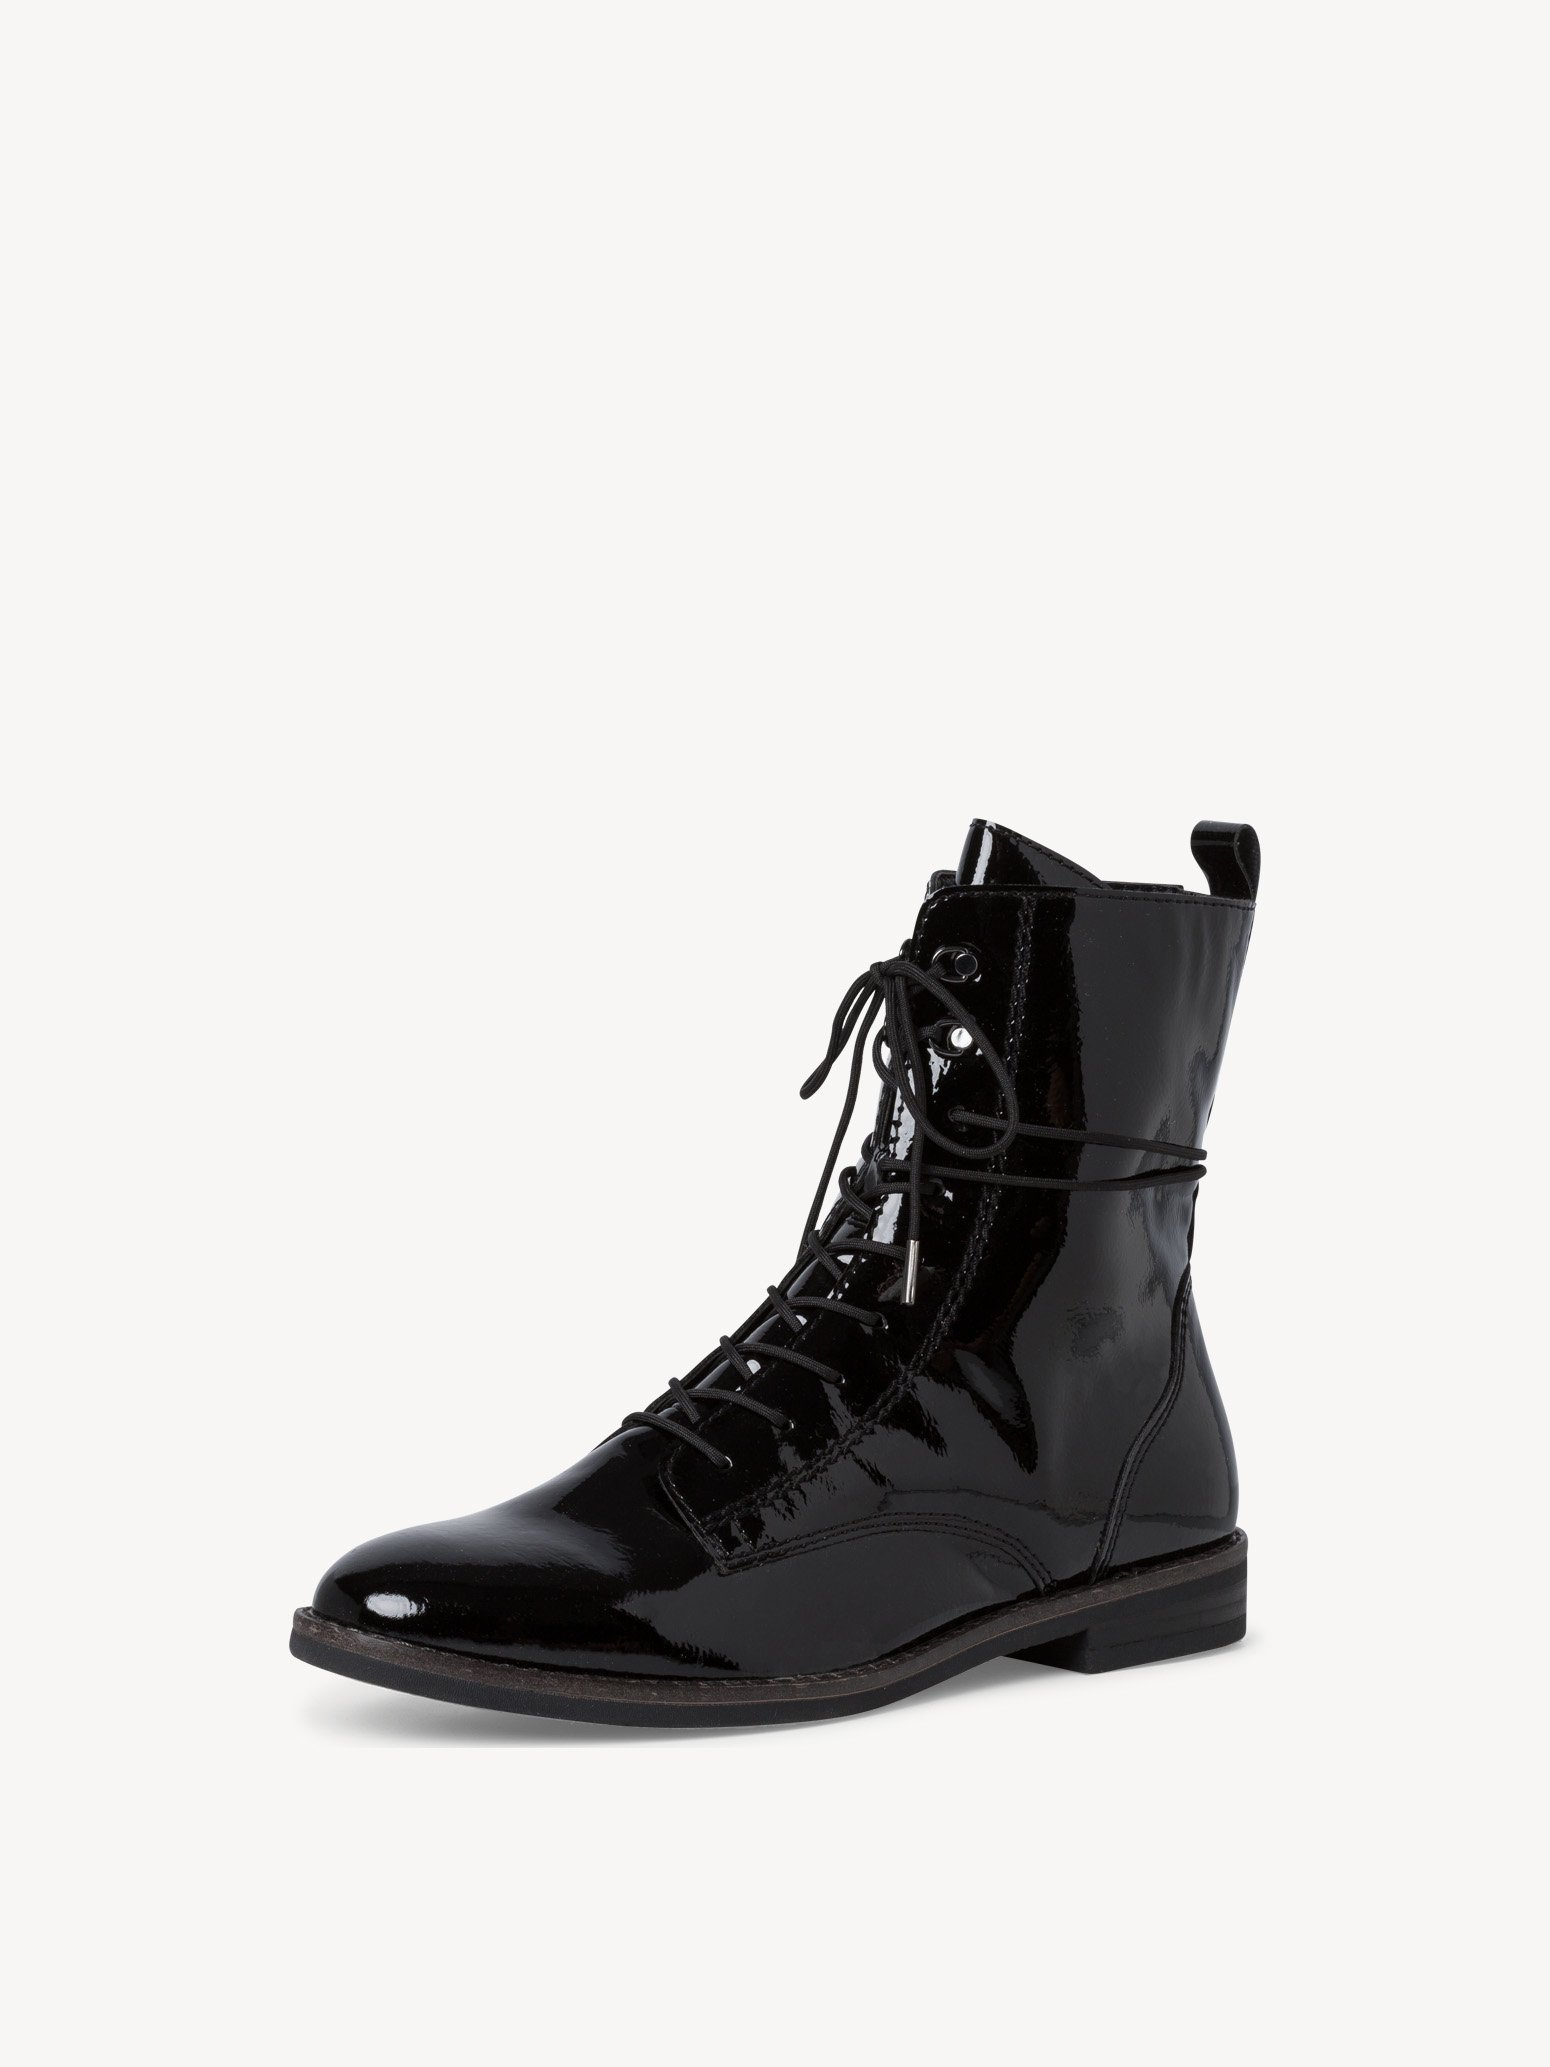 Ботинки Tamaris 1-1-25124-27-018